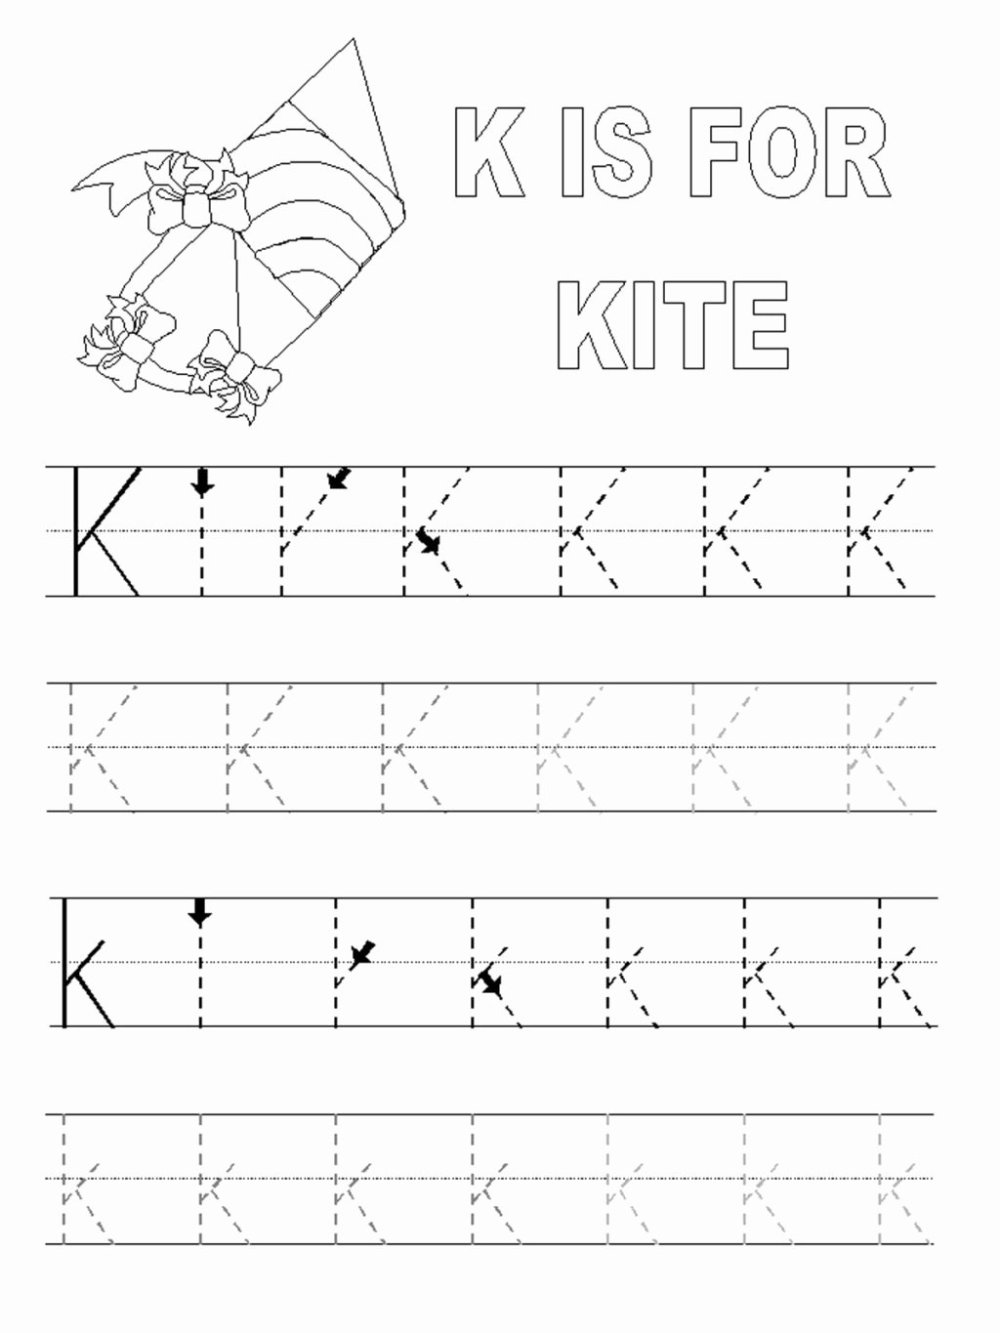 medium resolution of Abc Worksheets for Preschoolers New Worksheet Free Printable Writing Sheets  for Kids – Printable Worksheets for Kids